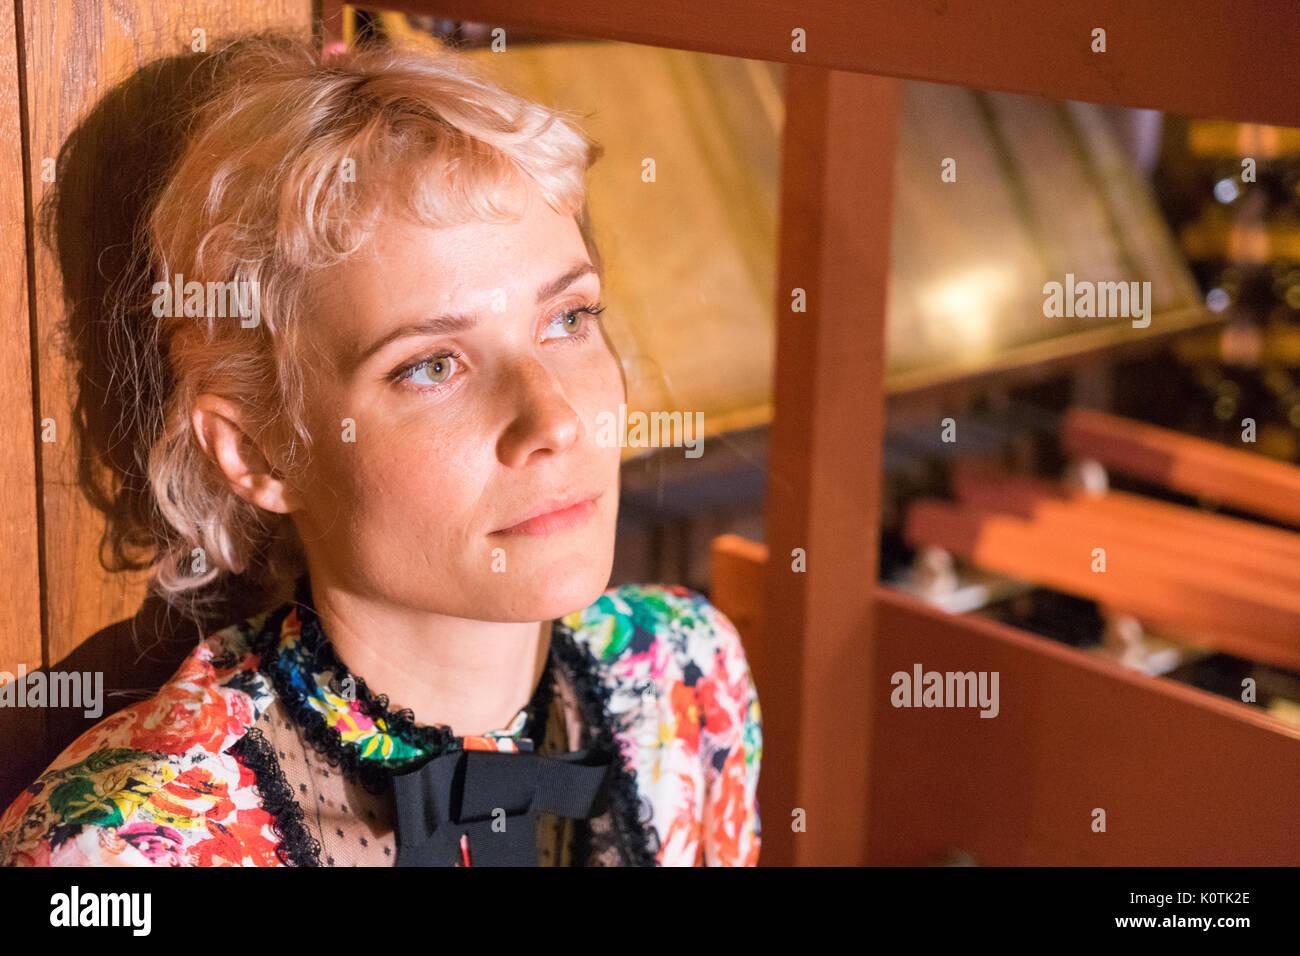 Oh Land, Dansk Theologe, Musiker, Sanger, danser og Hersteller/Oh Land aka Nanna Øland, dänischer Komponist, Musiker, Sänger, Tänzer und Produzent Stockbild